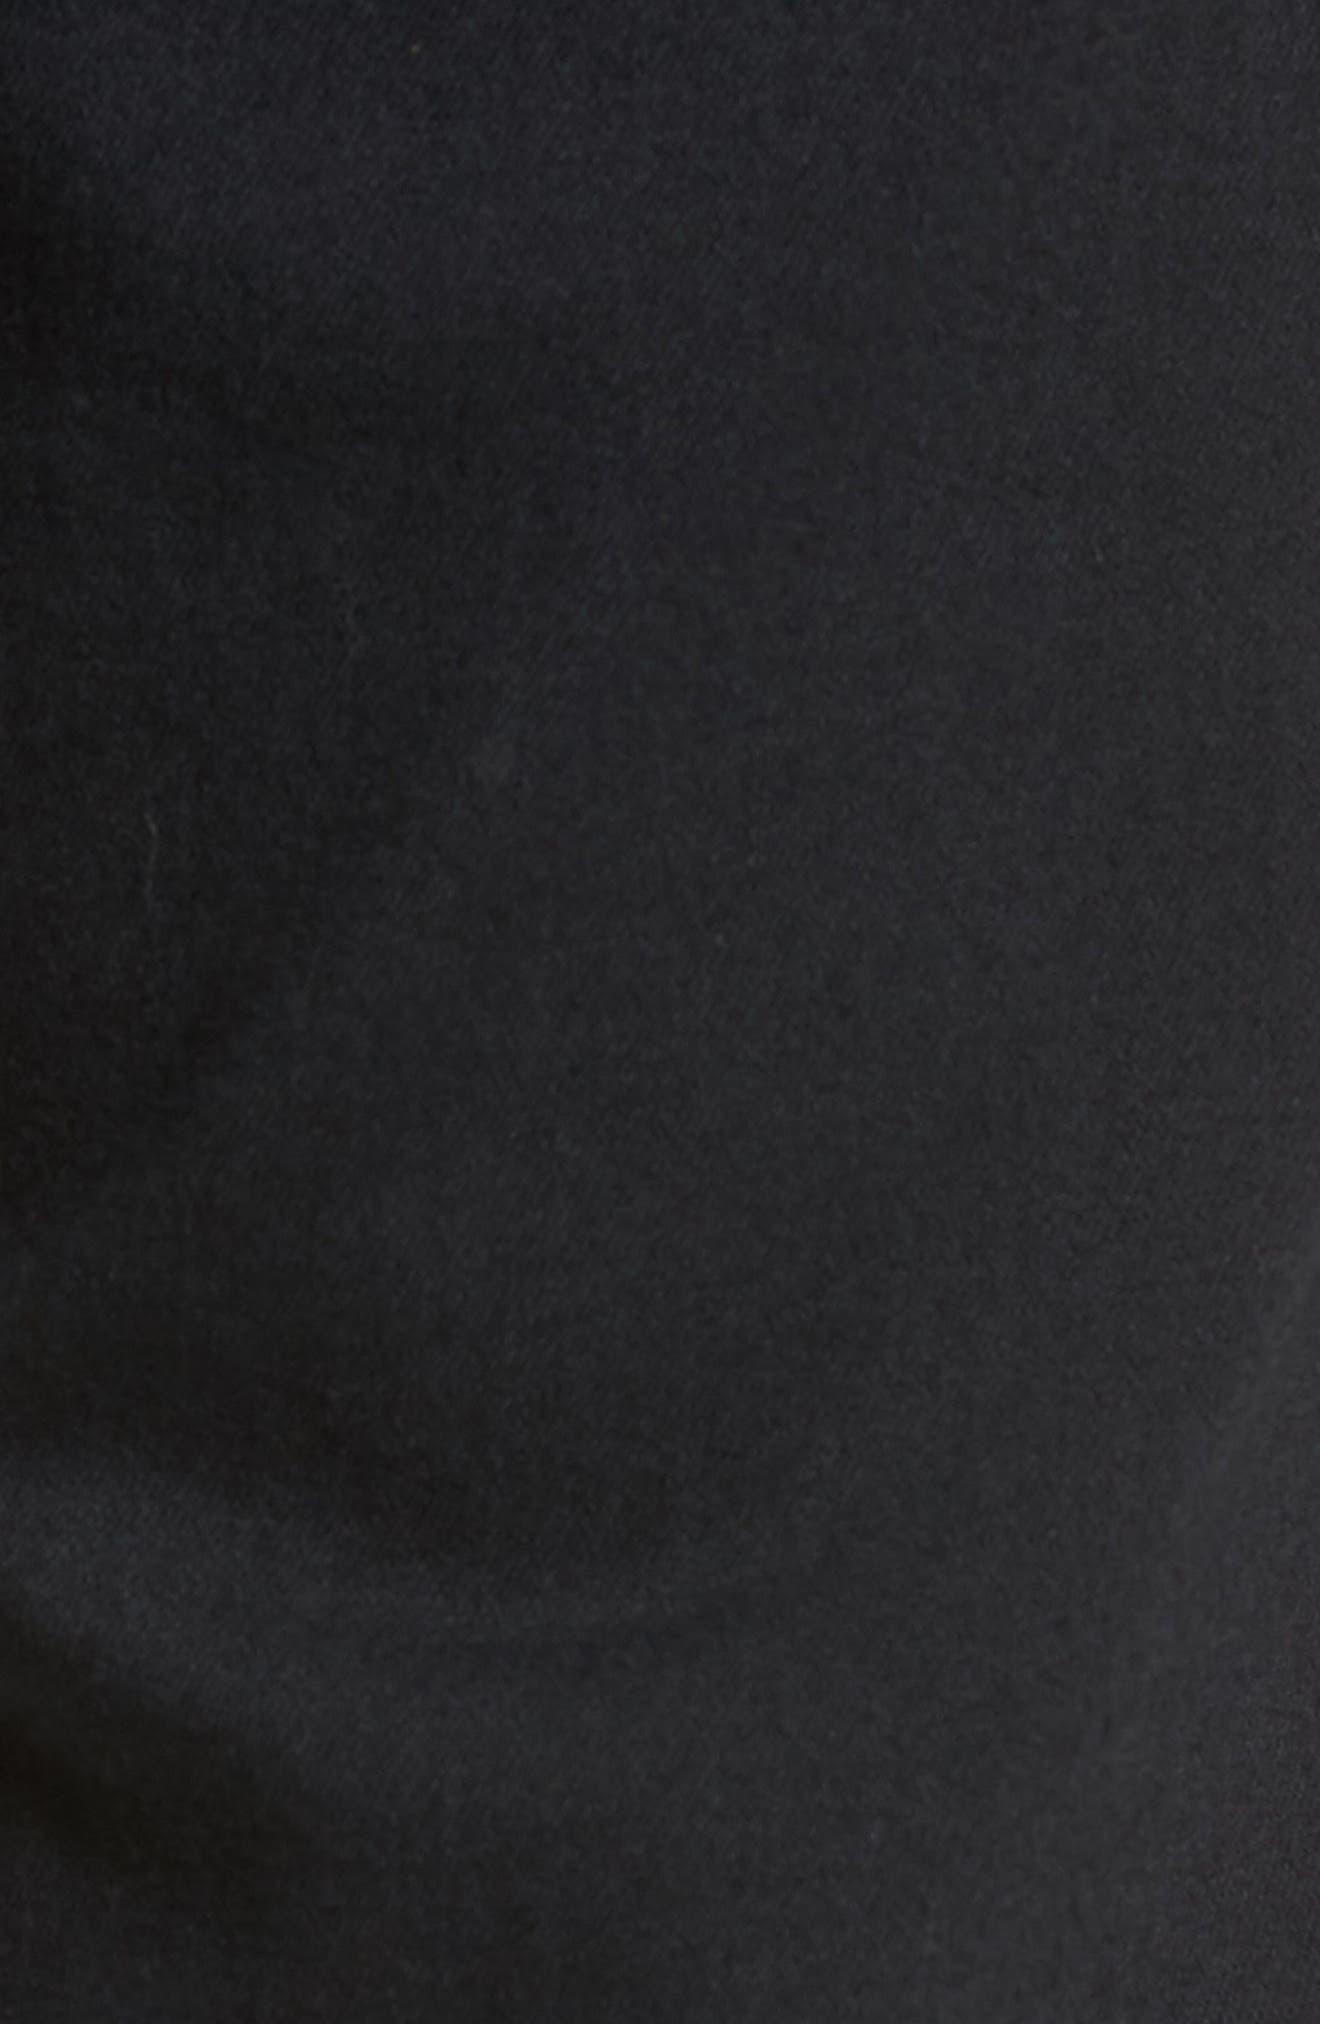 Weird Guy Slim Fit Jeans,                             Alternate thumbnail 5, color,                             Black